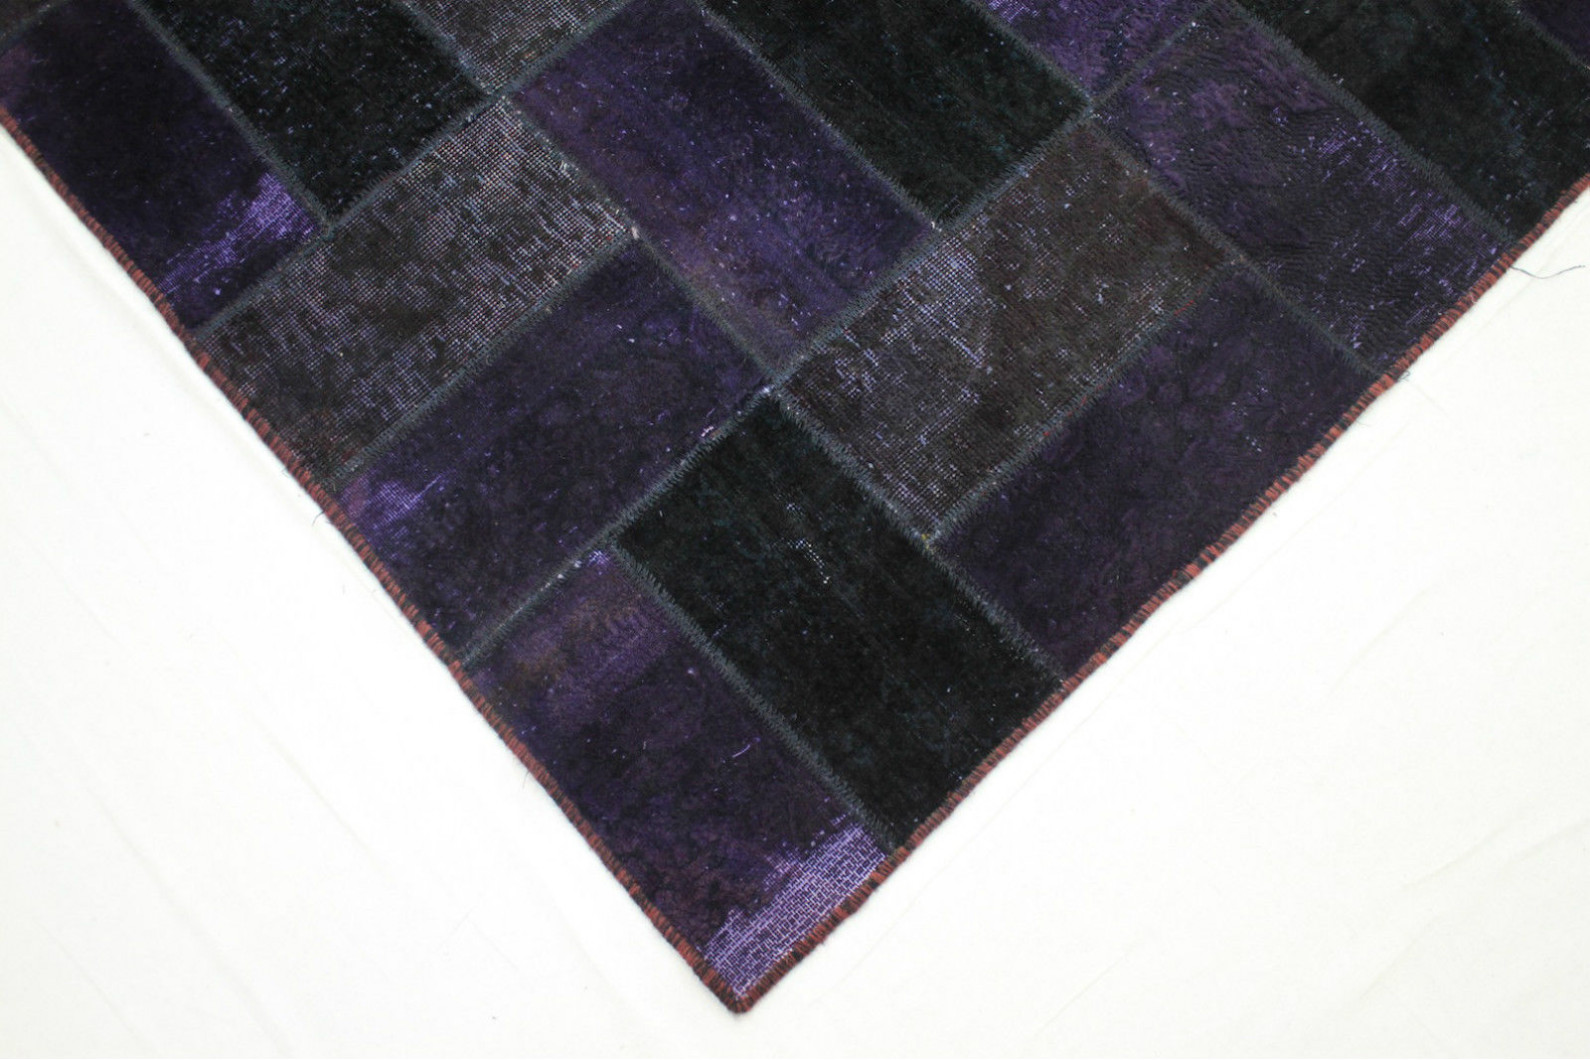 patchwork teppich lila in 320x240cm 1001 1829 bei. Black Bedroom Furniture Sets. Home Design Ideas